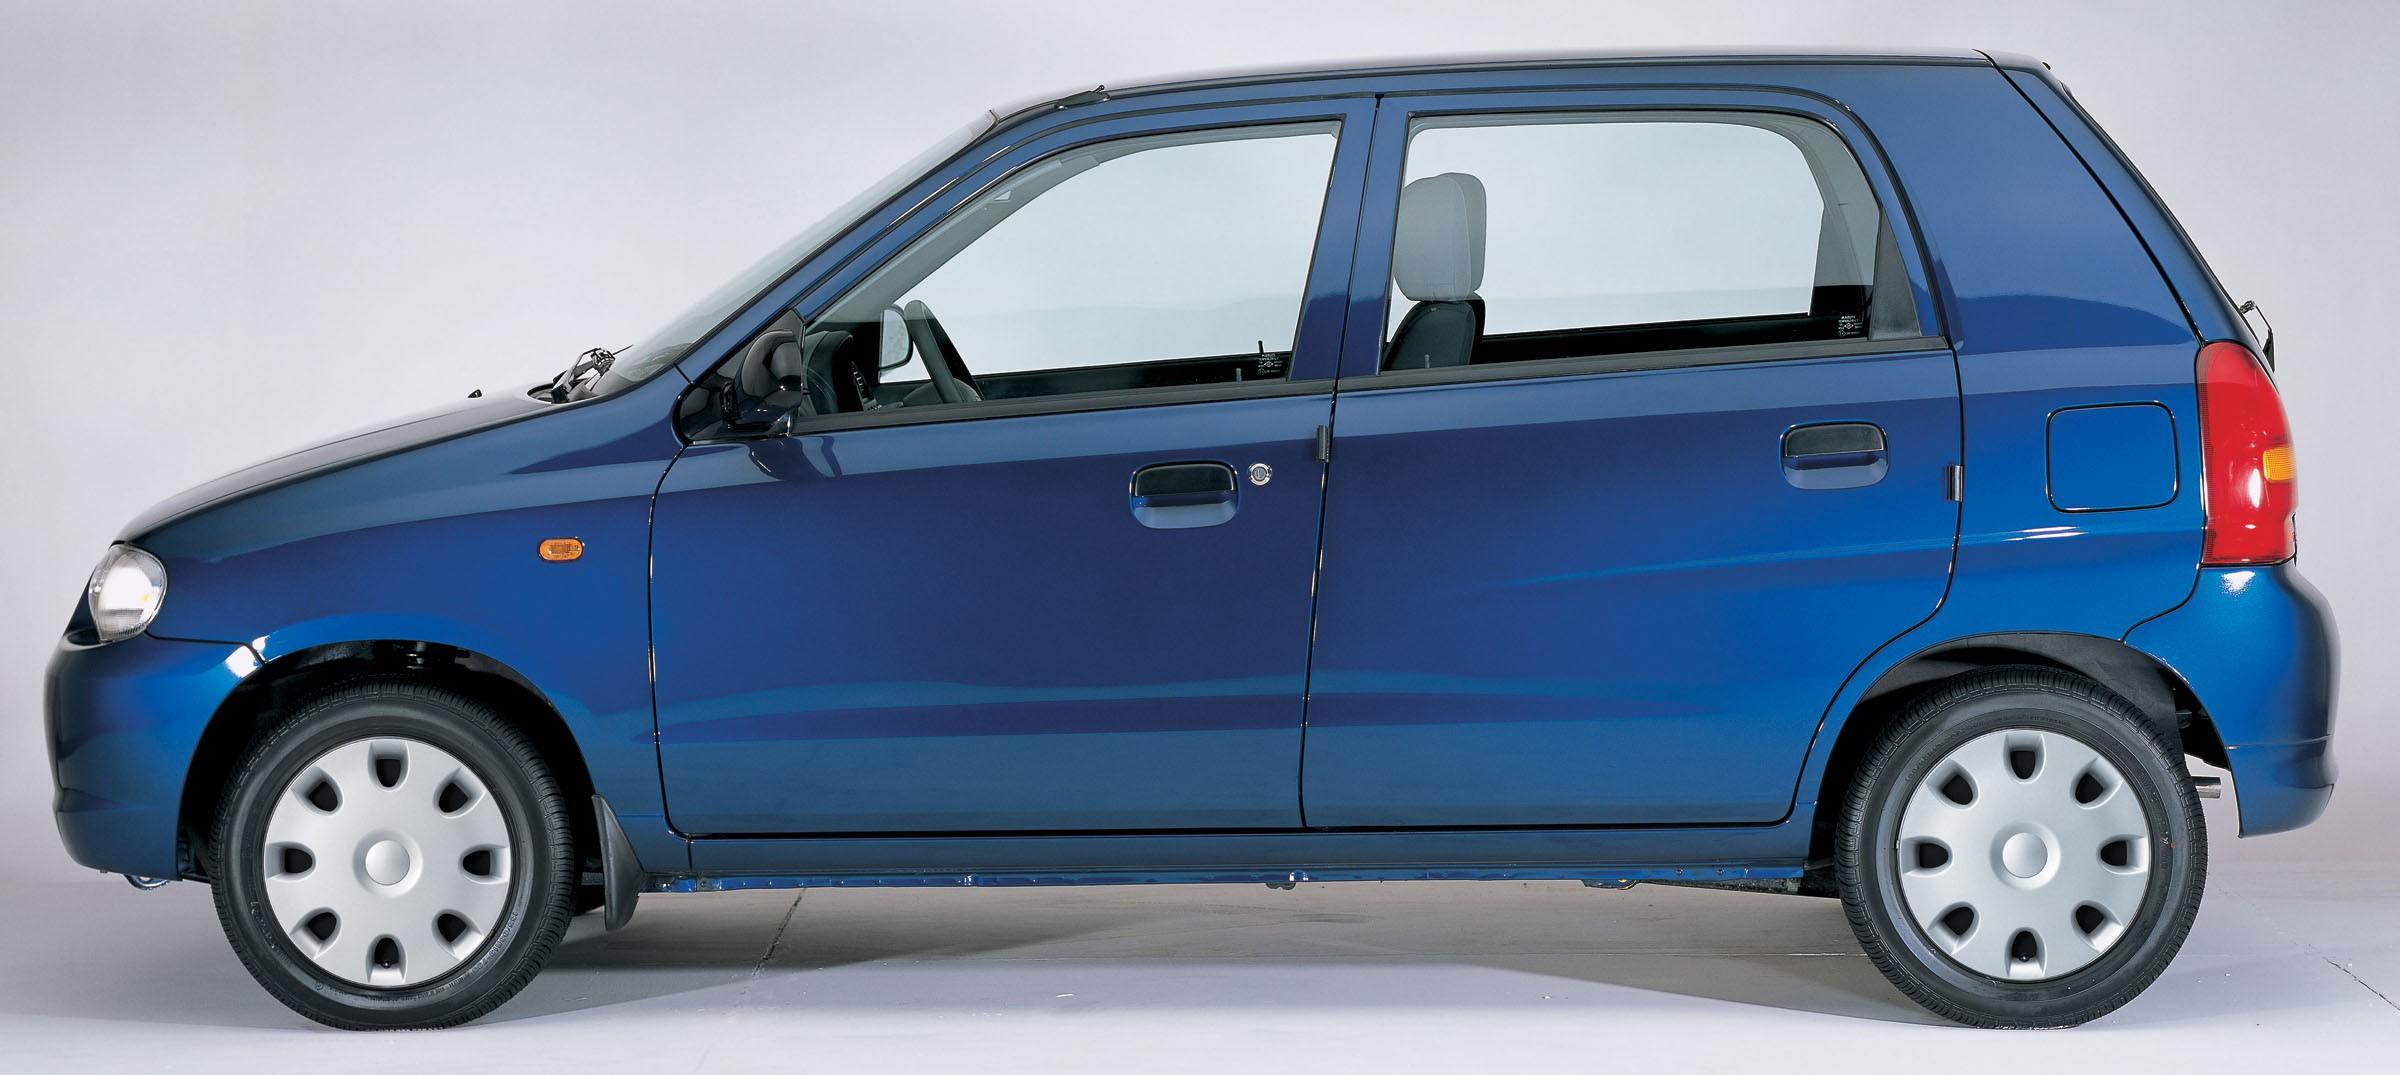 Suzuki Alto Specs 2002 2003 2004 2005 2006